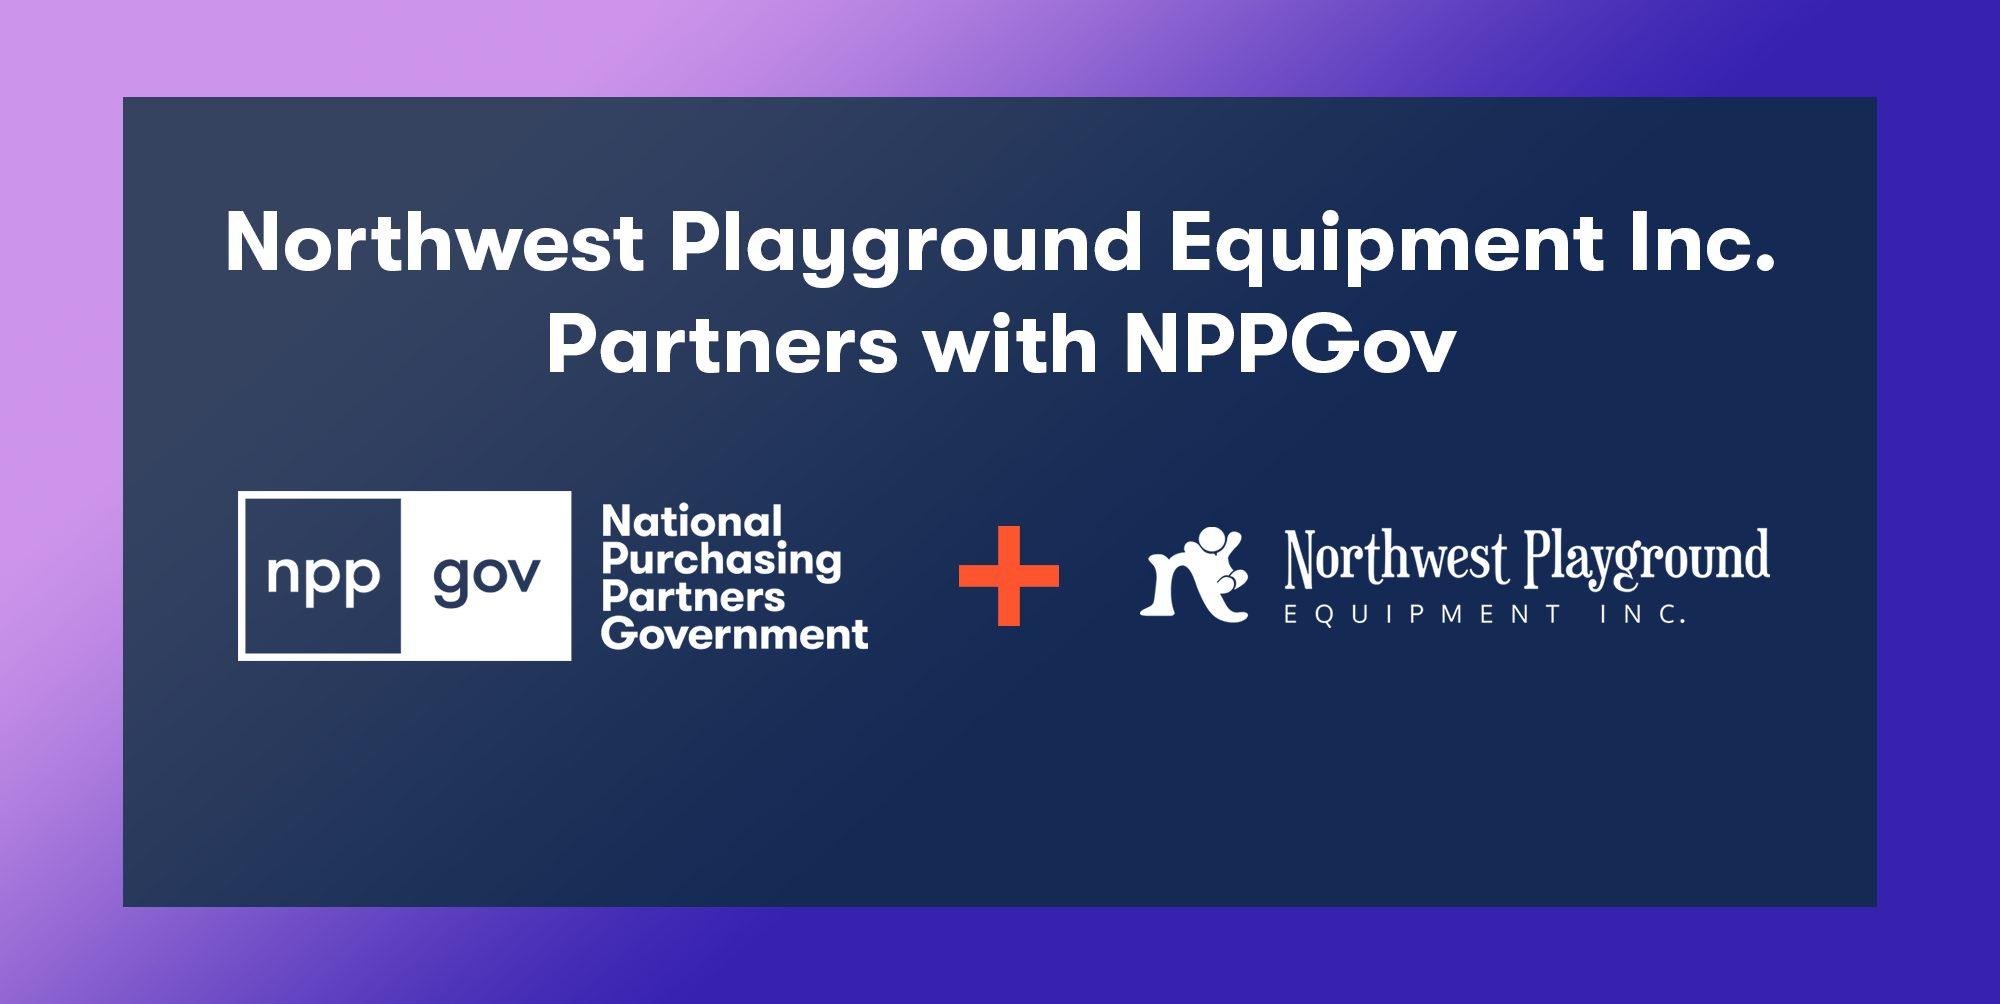 Northwest Playground Equipment Partners with NPPGov